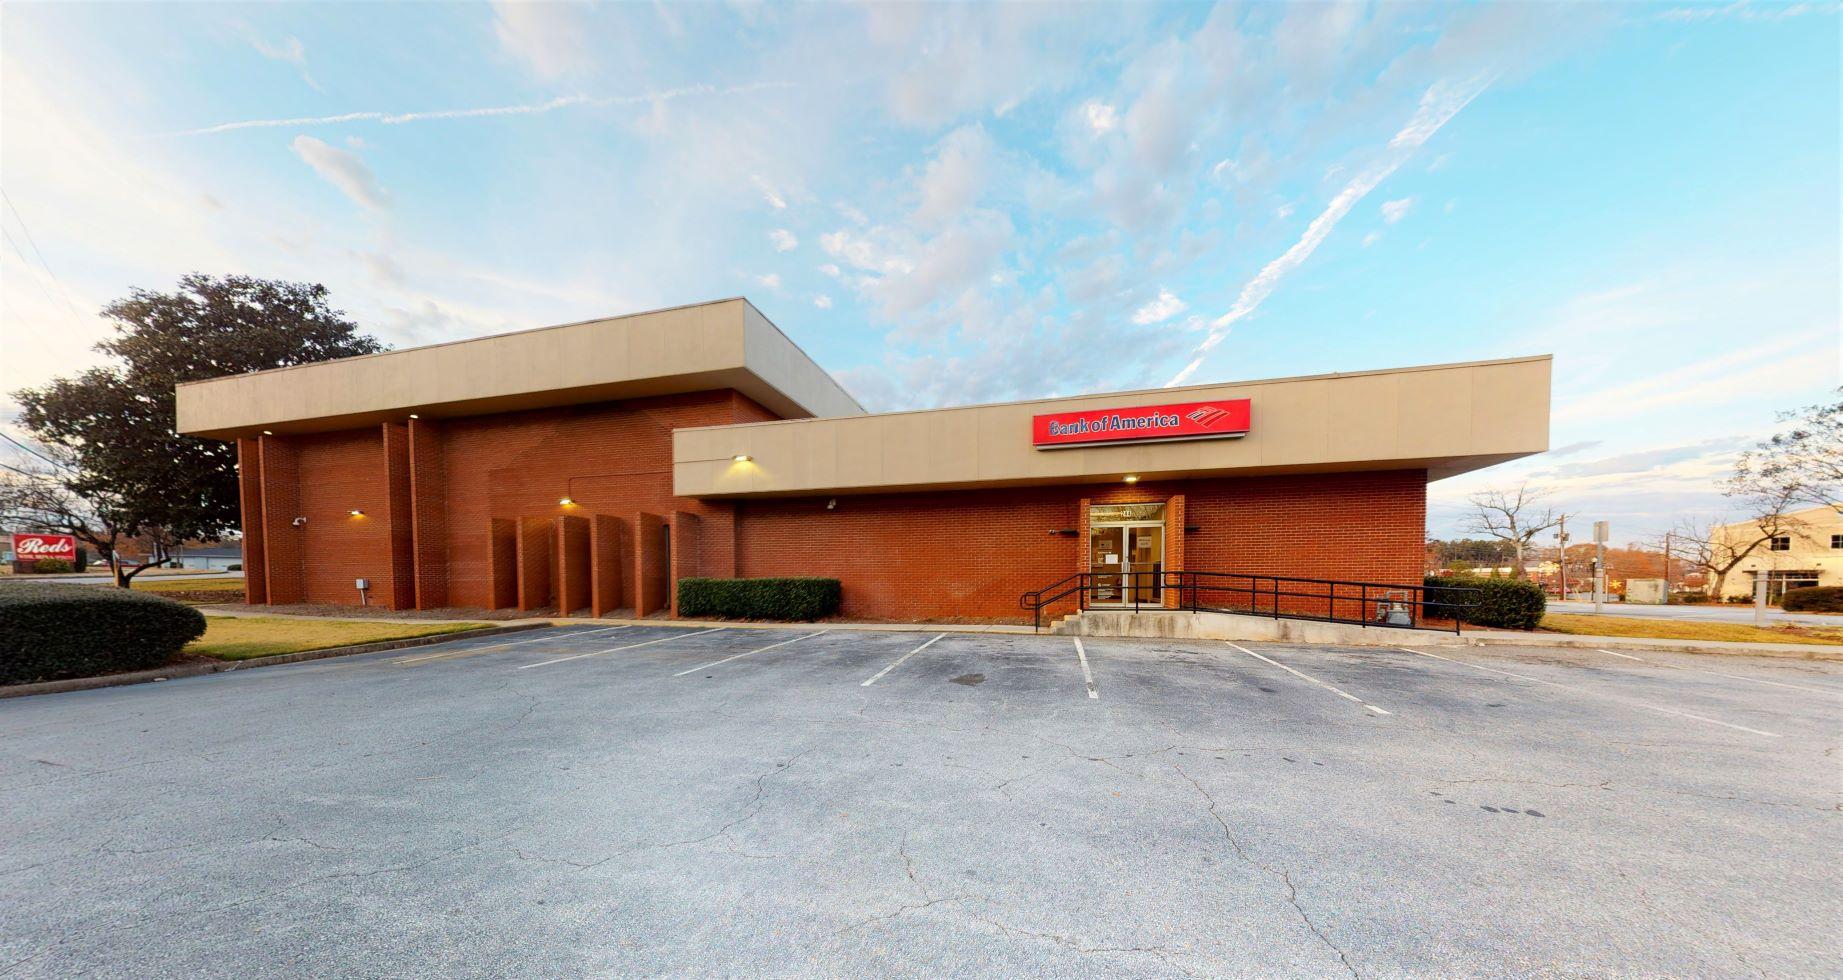 Bank of America financial center with walk-up ATM | 244 S Main St, Alpharetta, GA 30009